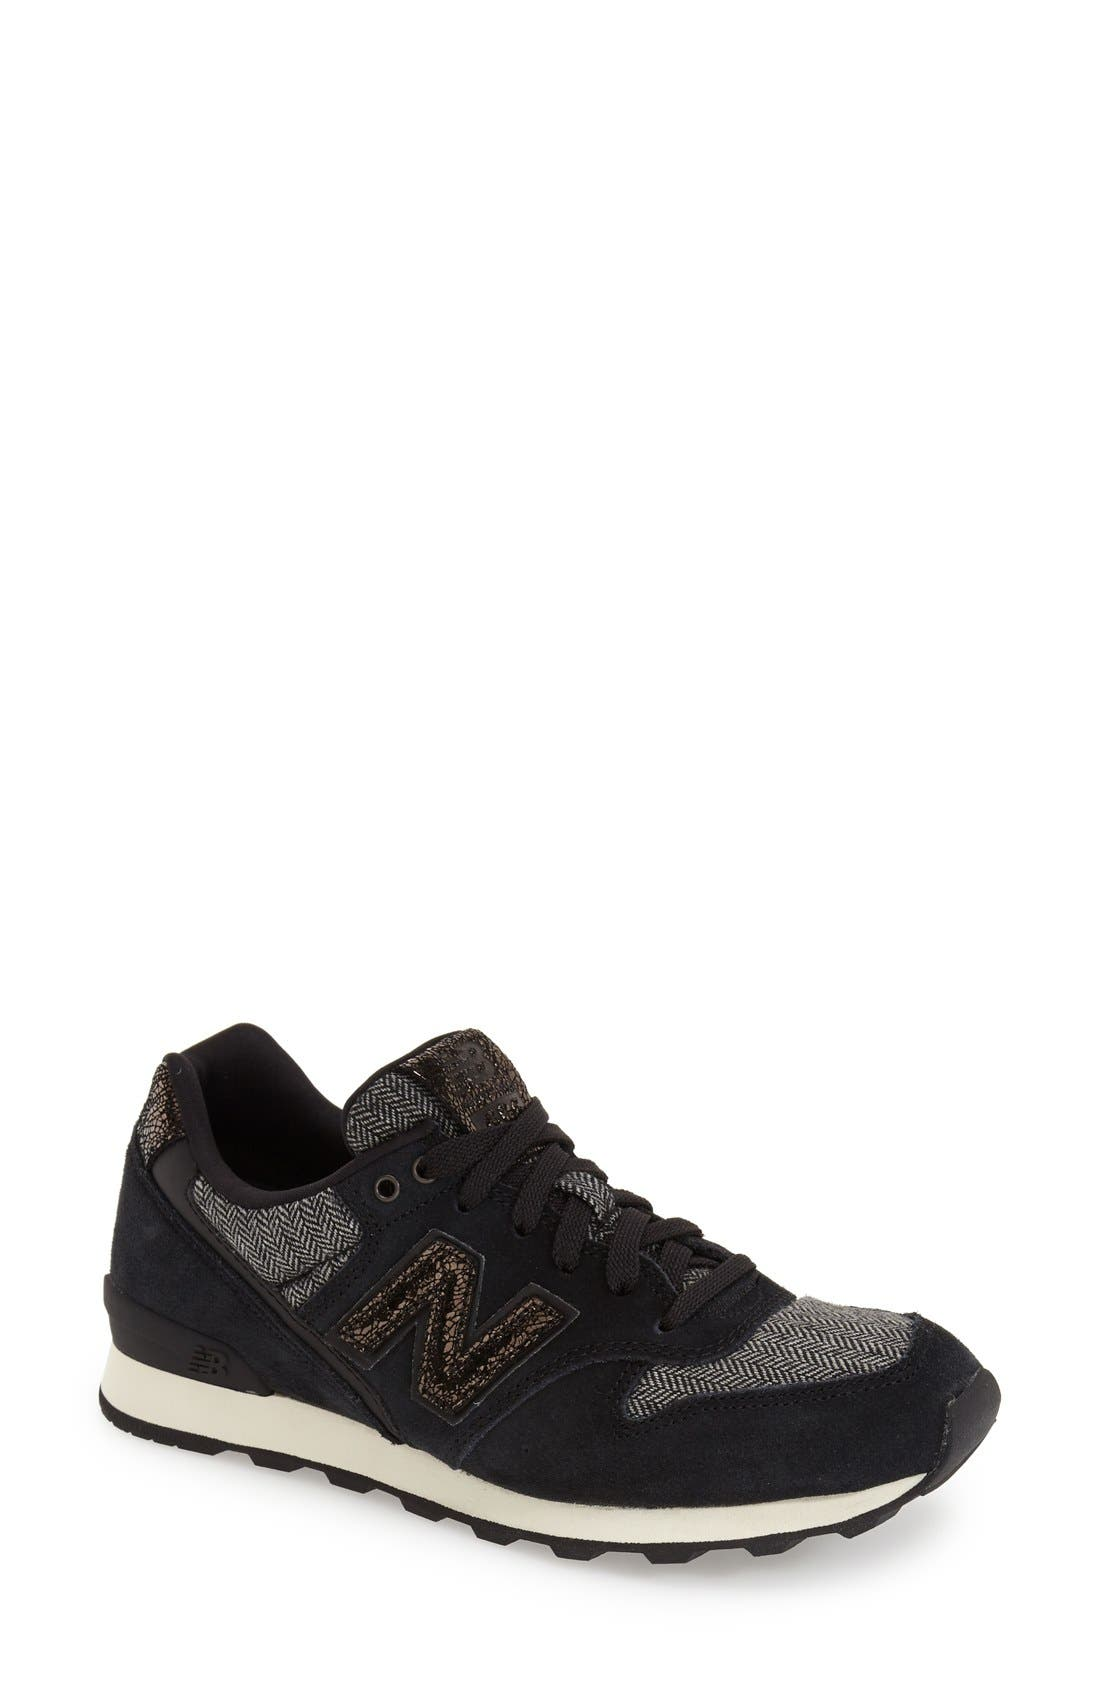 '696' Sneaker,                             Main thumbnail 1, color,                             001